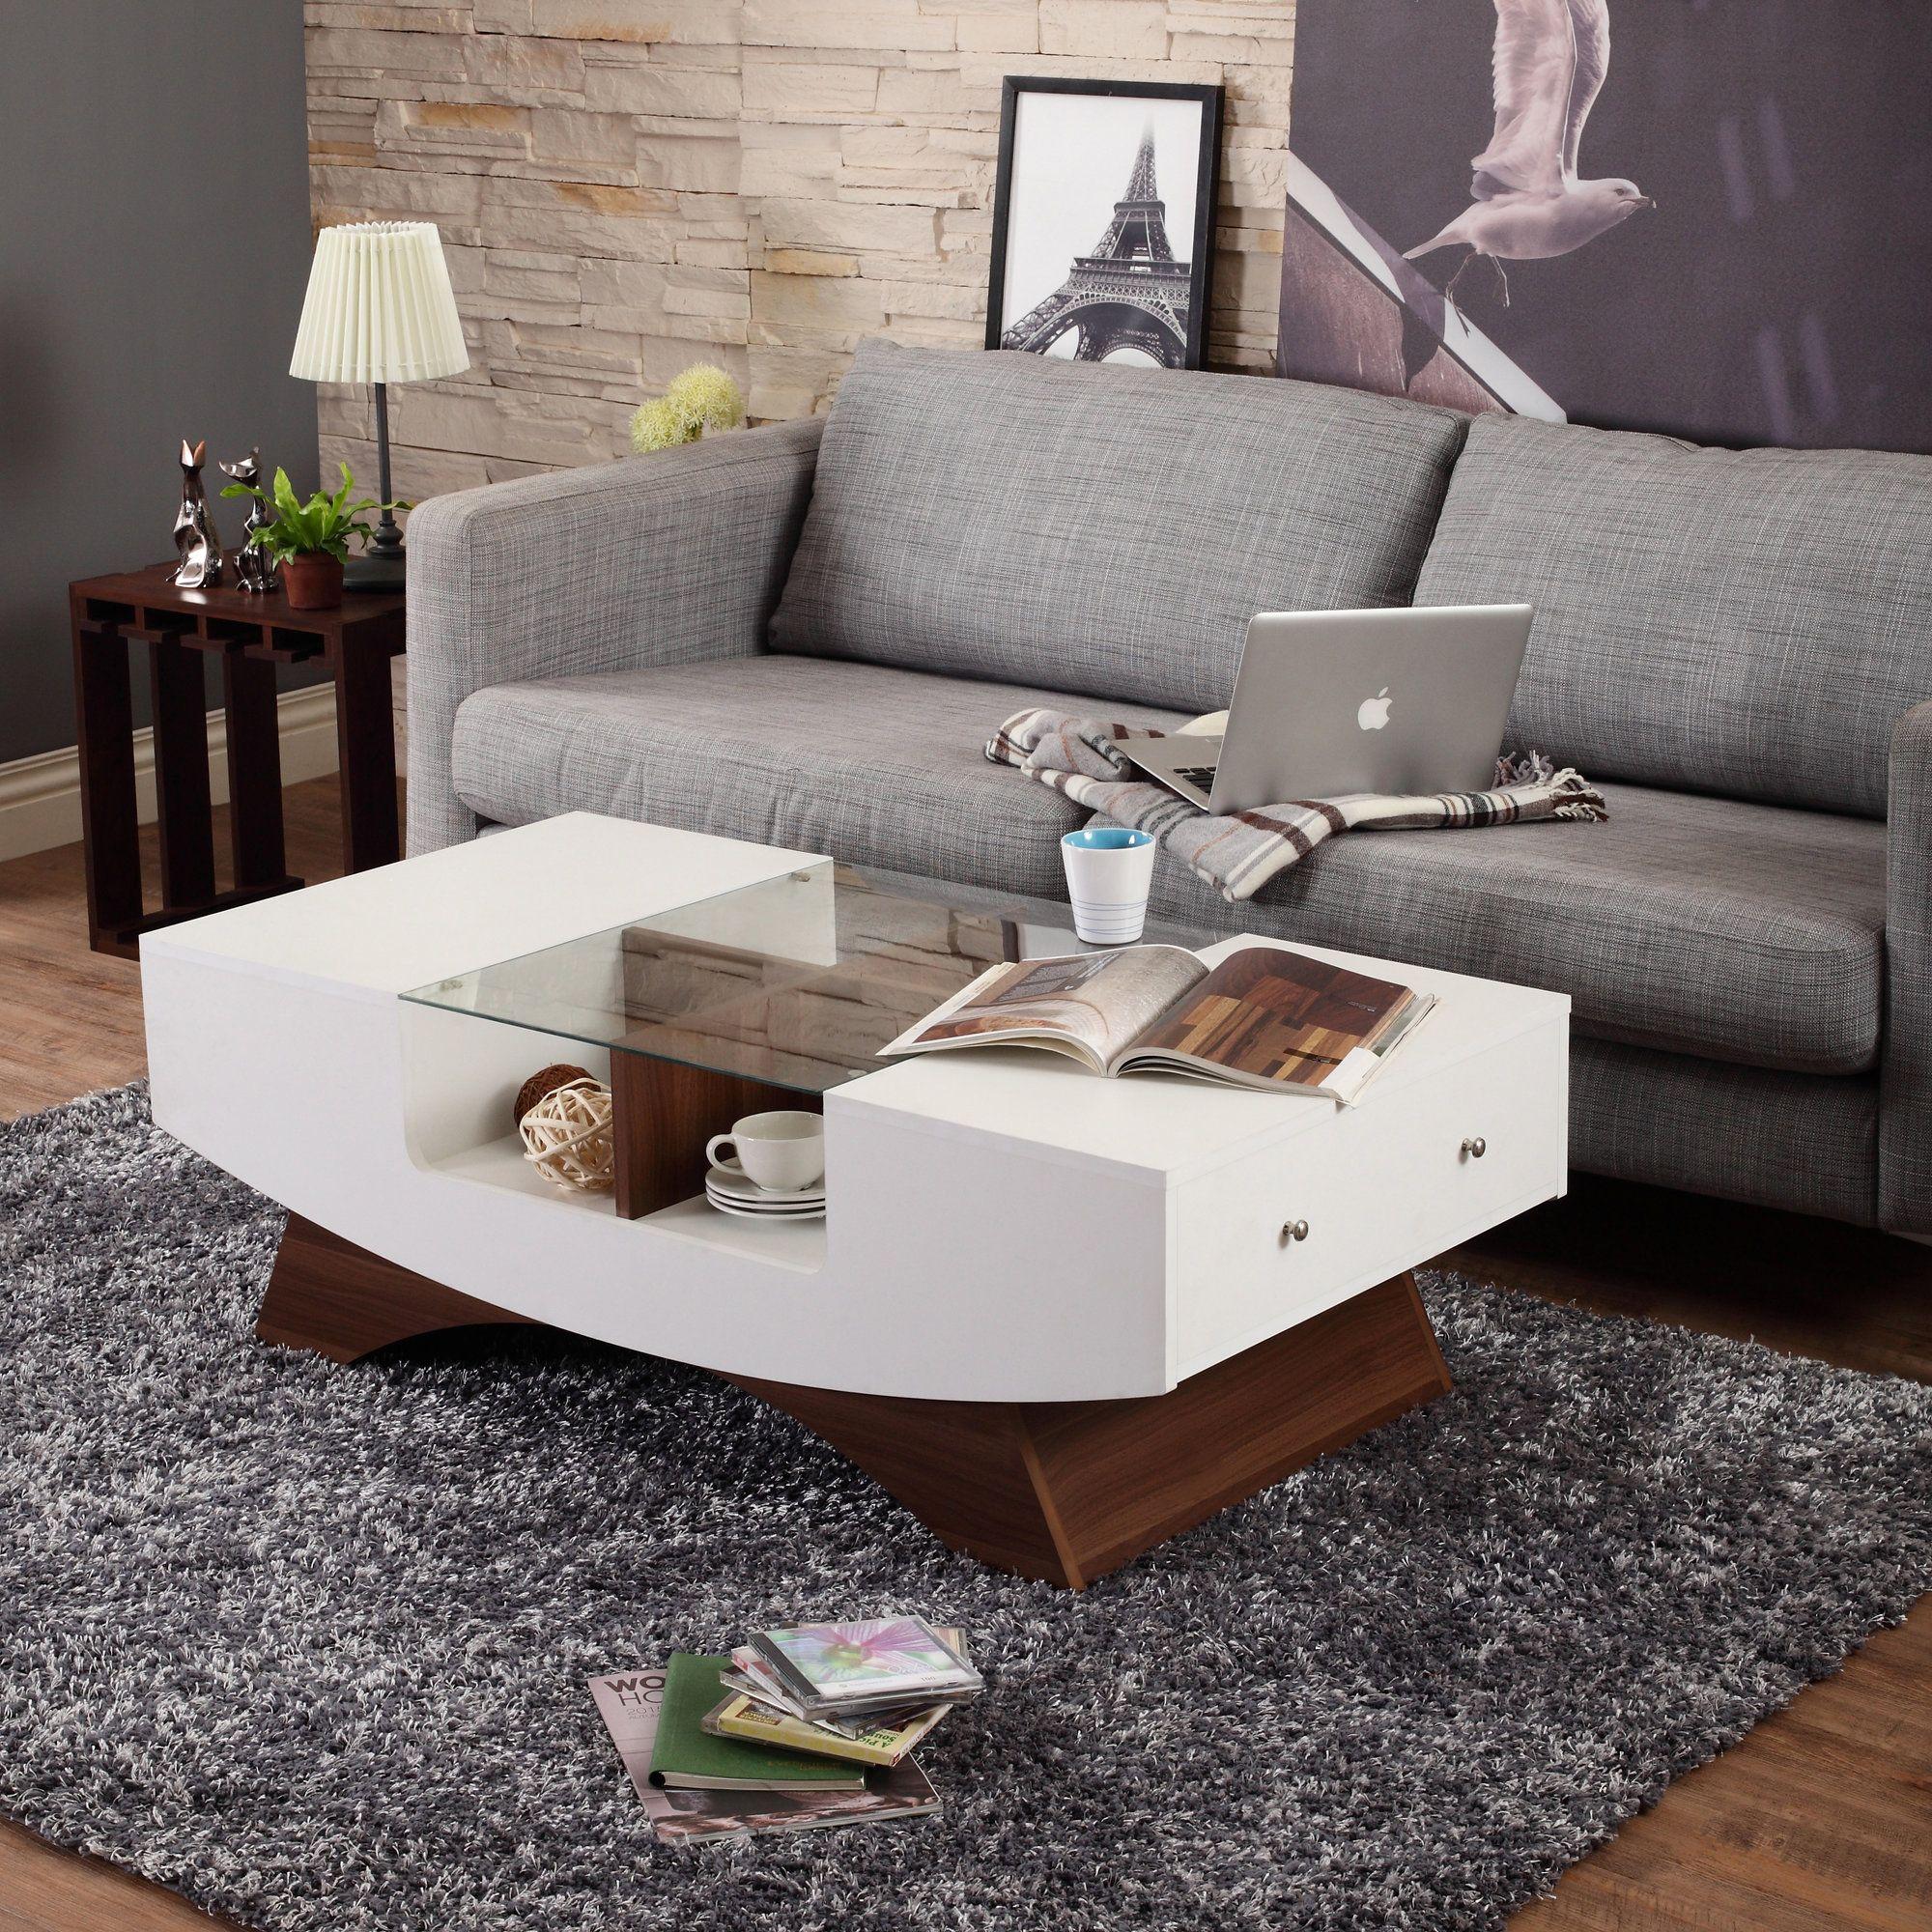 Madilynn Coffee Table Coffee Table Coffee Table Design Modern Furniture [ 2000 x 2000 Pixel ]